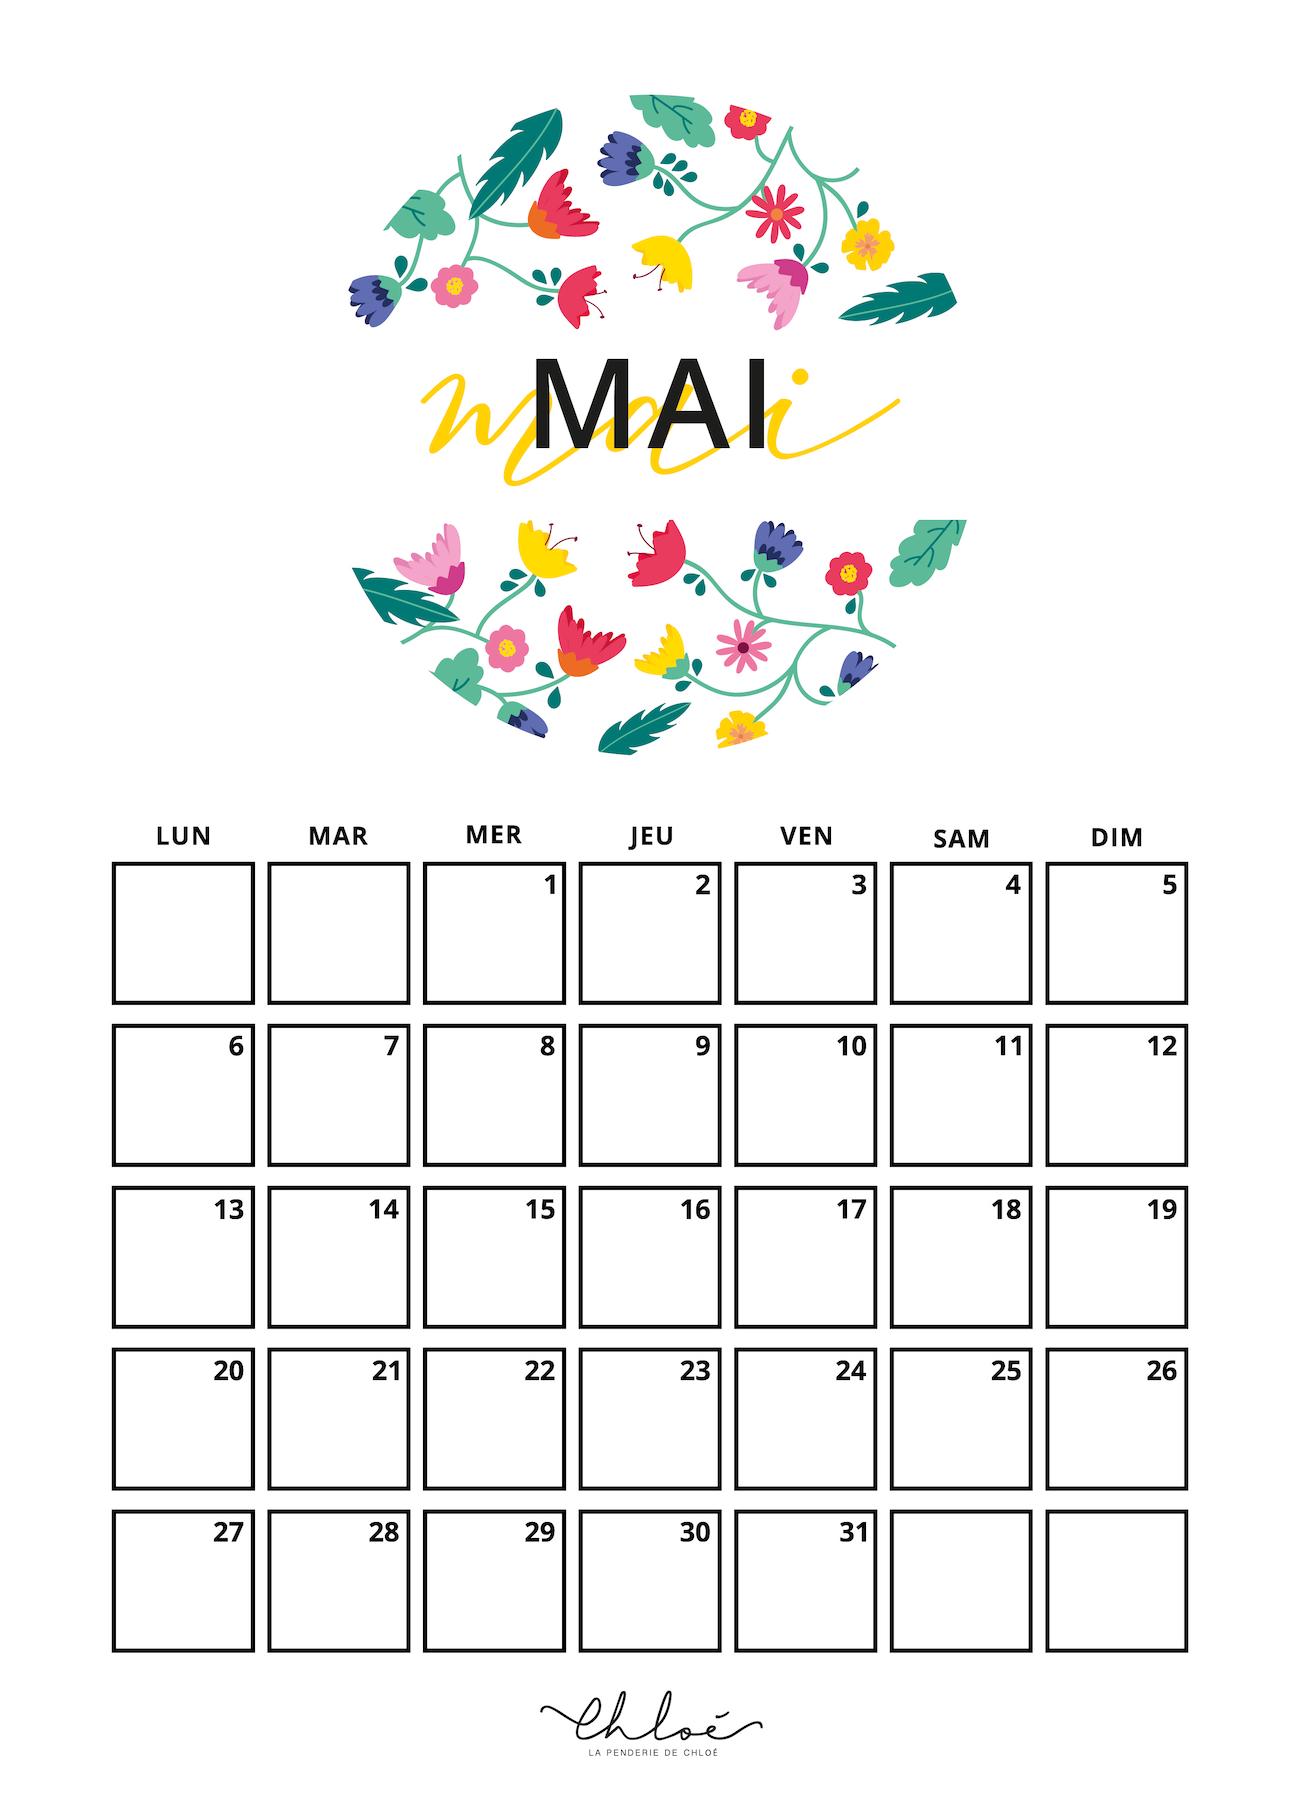 Calendrier Mai 2019 A Imprimer Gratuit.Calendrier Mai A Imprimer Printables La Penderie De Chloe